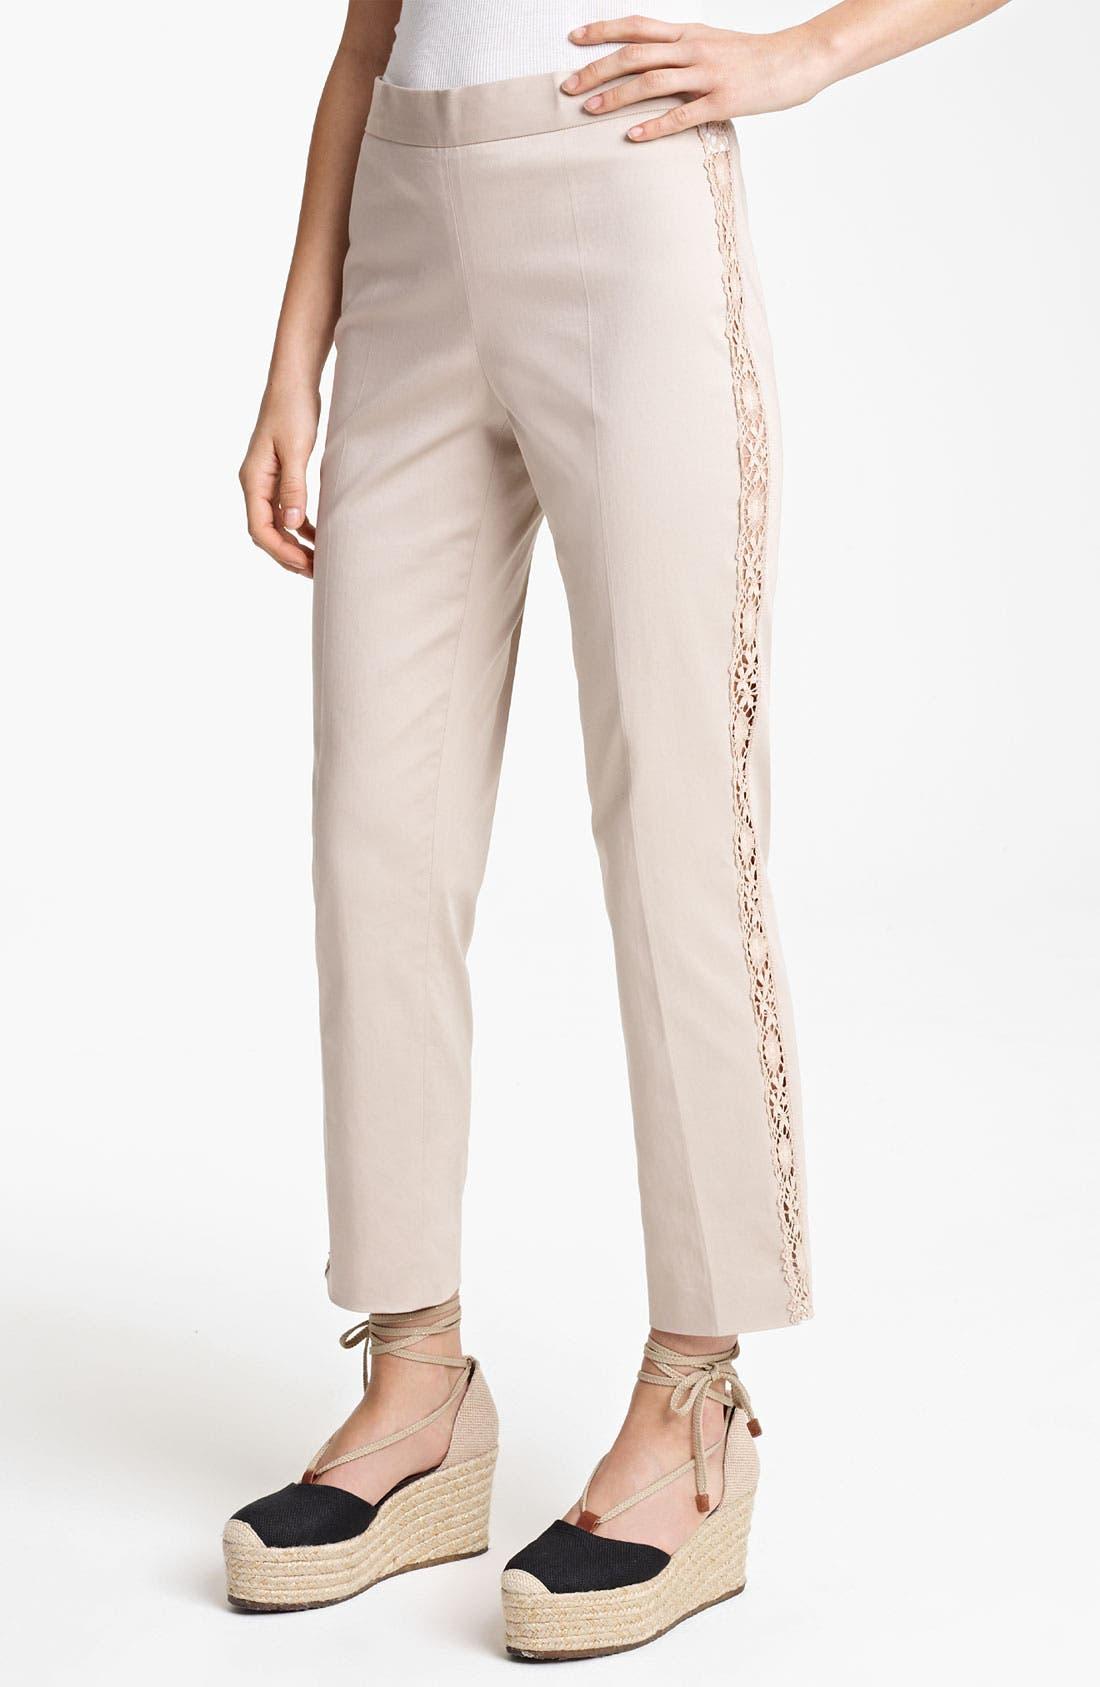 Alternate Image 1 Selected - Jean Paul Gaultier Lace Detail Stretch Gabardine Pants